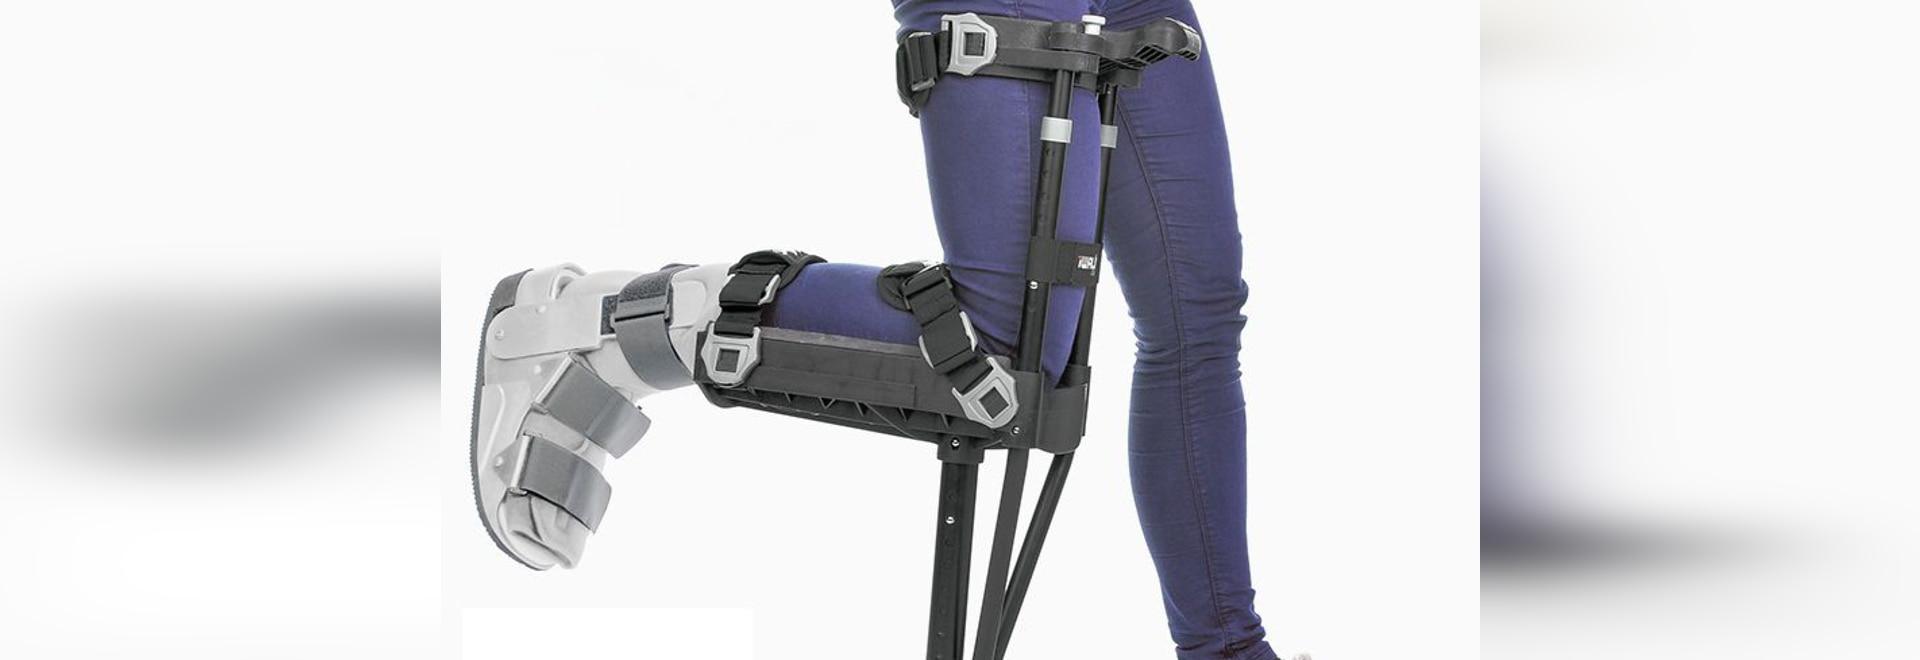 NEW: hands-free crutch by iWALKFree